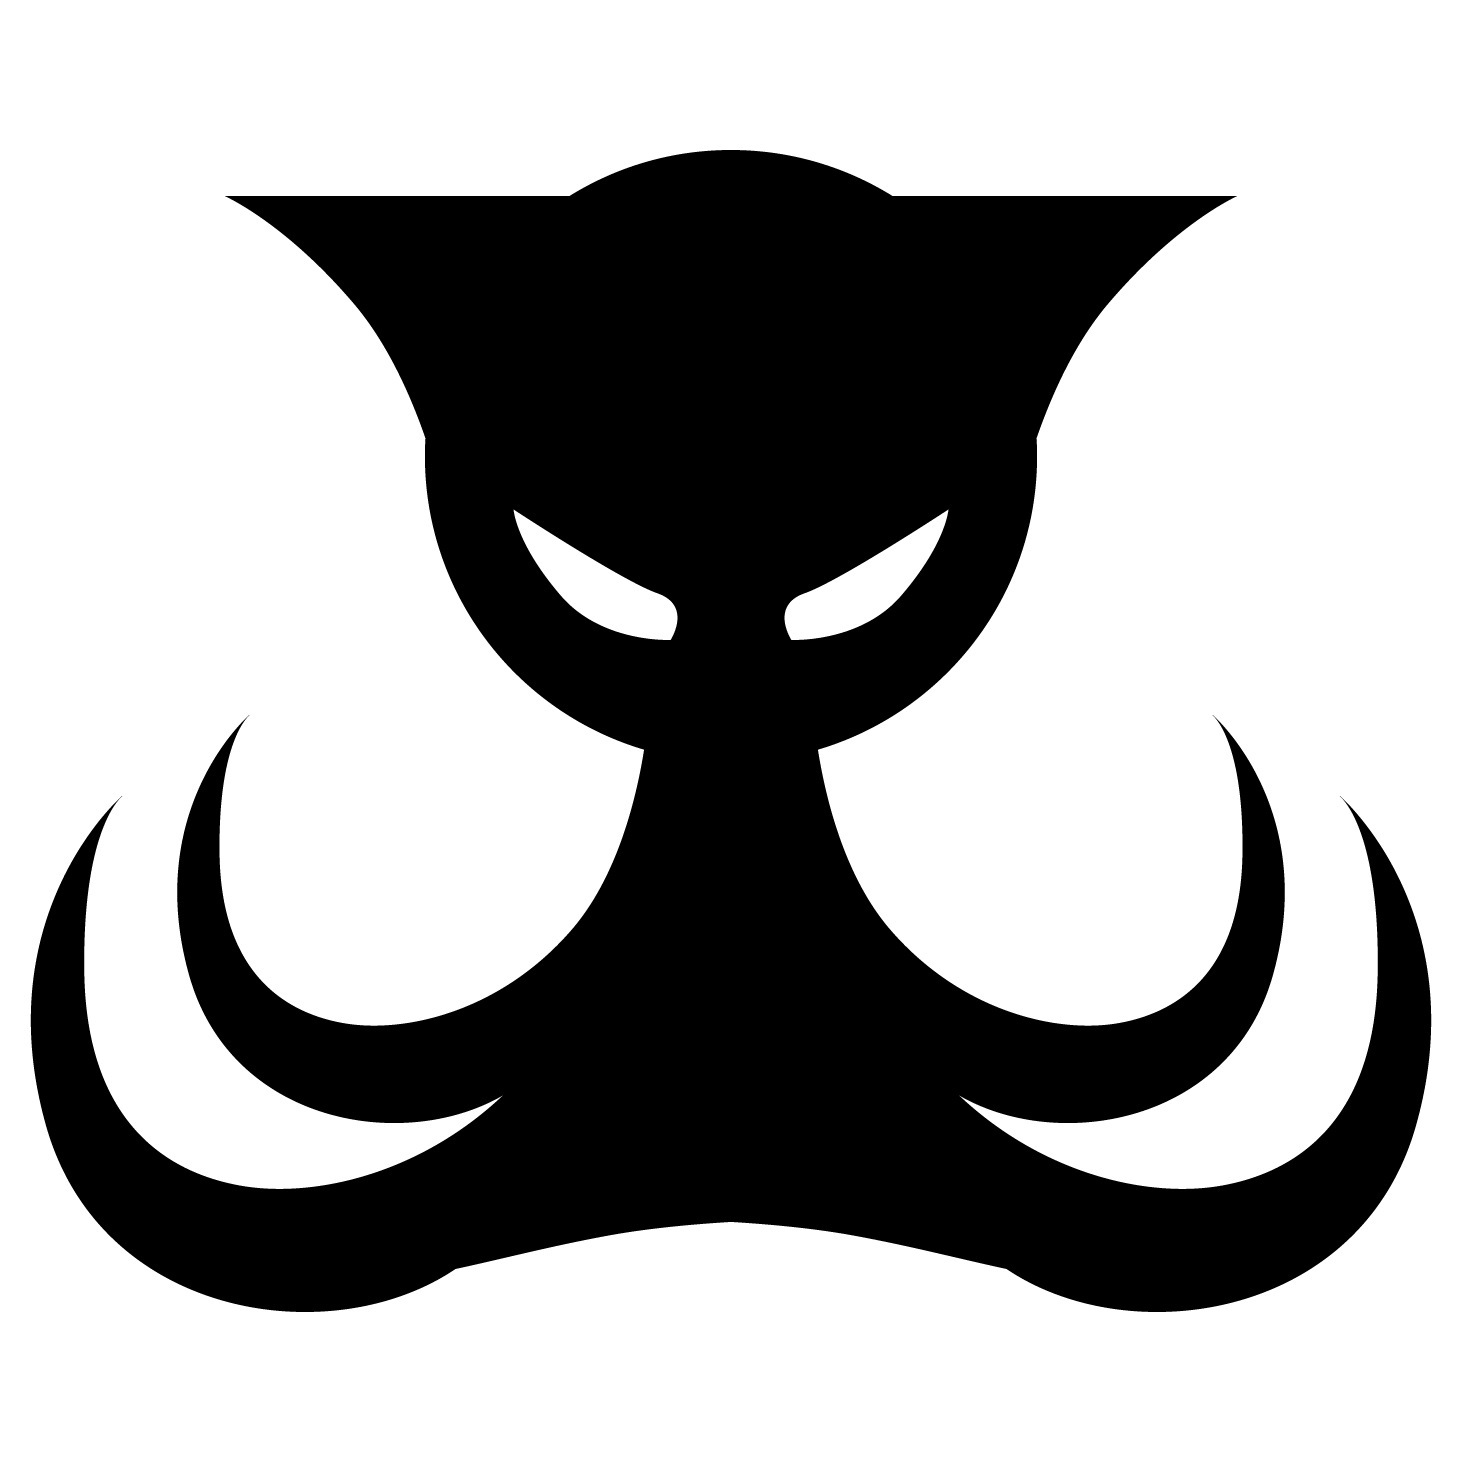 Hashtopolis